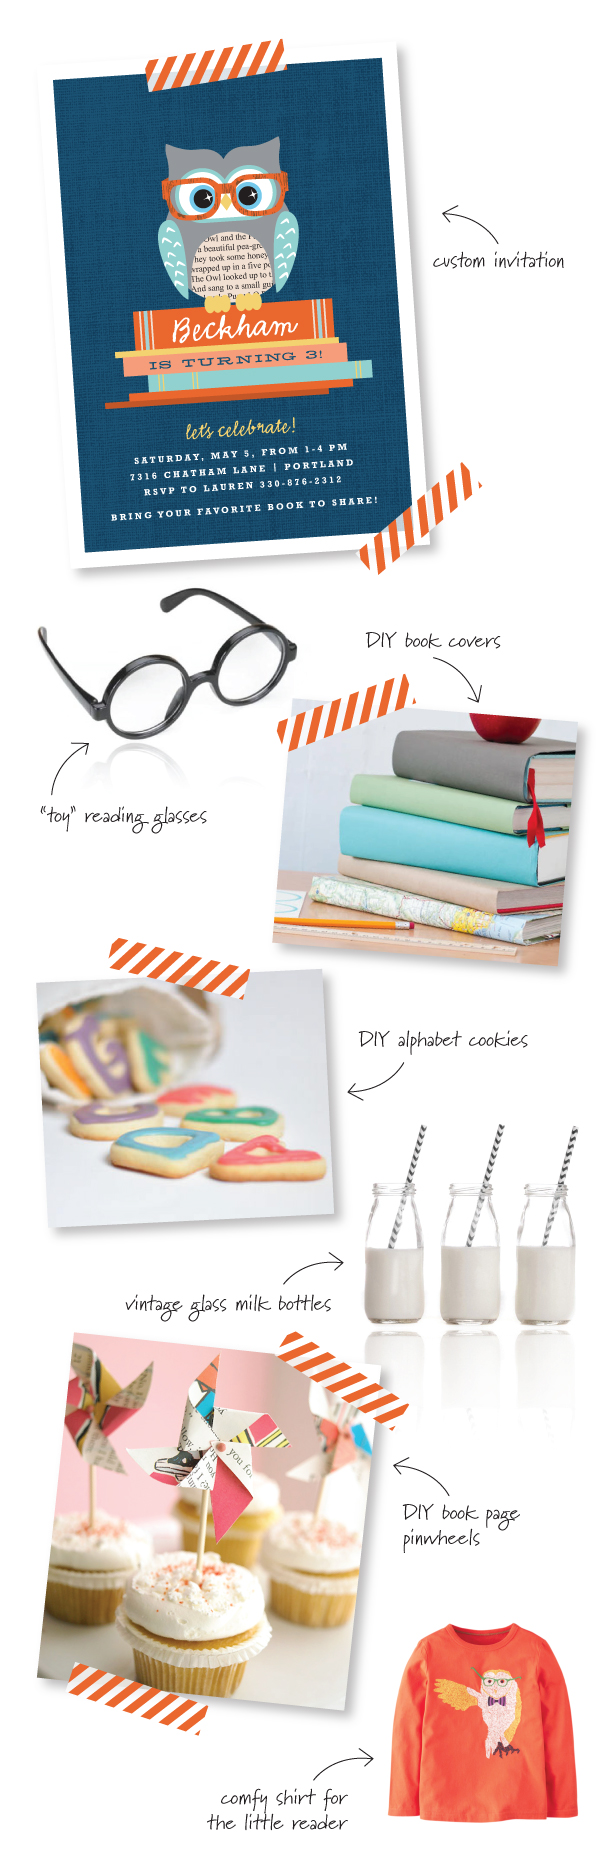 Book party ideas